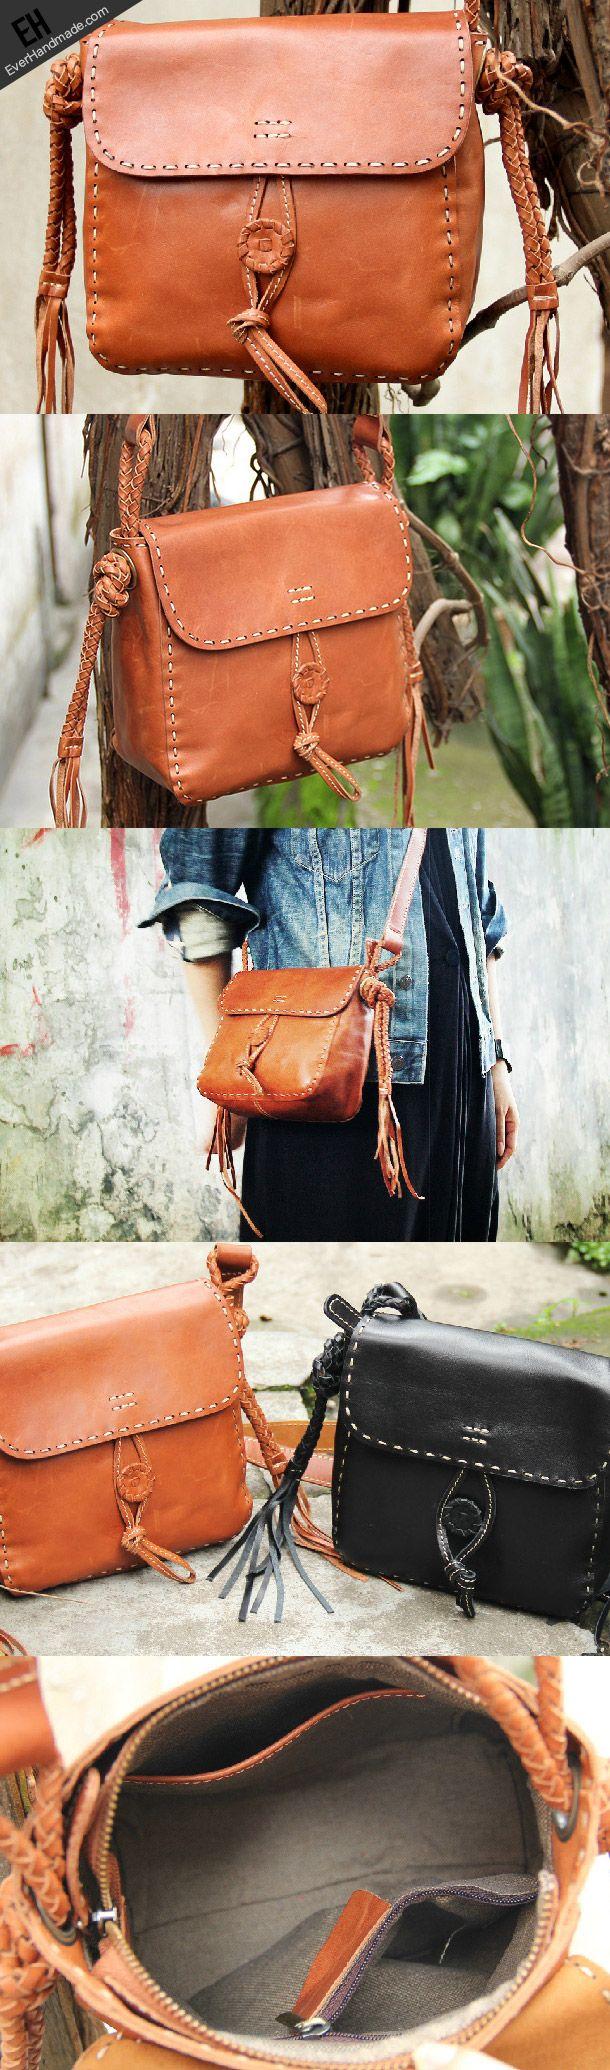 Handmade vintage rustic brown leather crossbody Shoulder Bag for women   EverHandmade